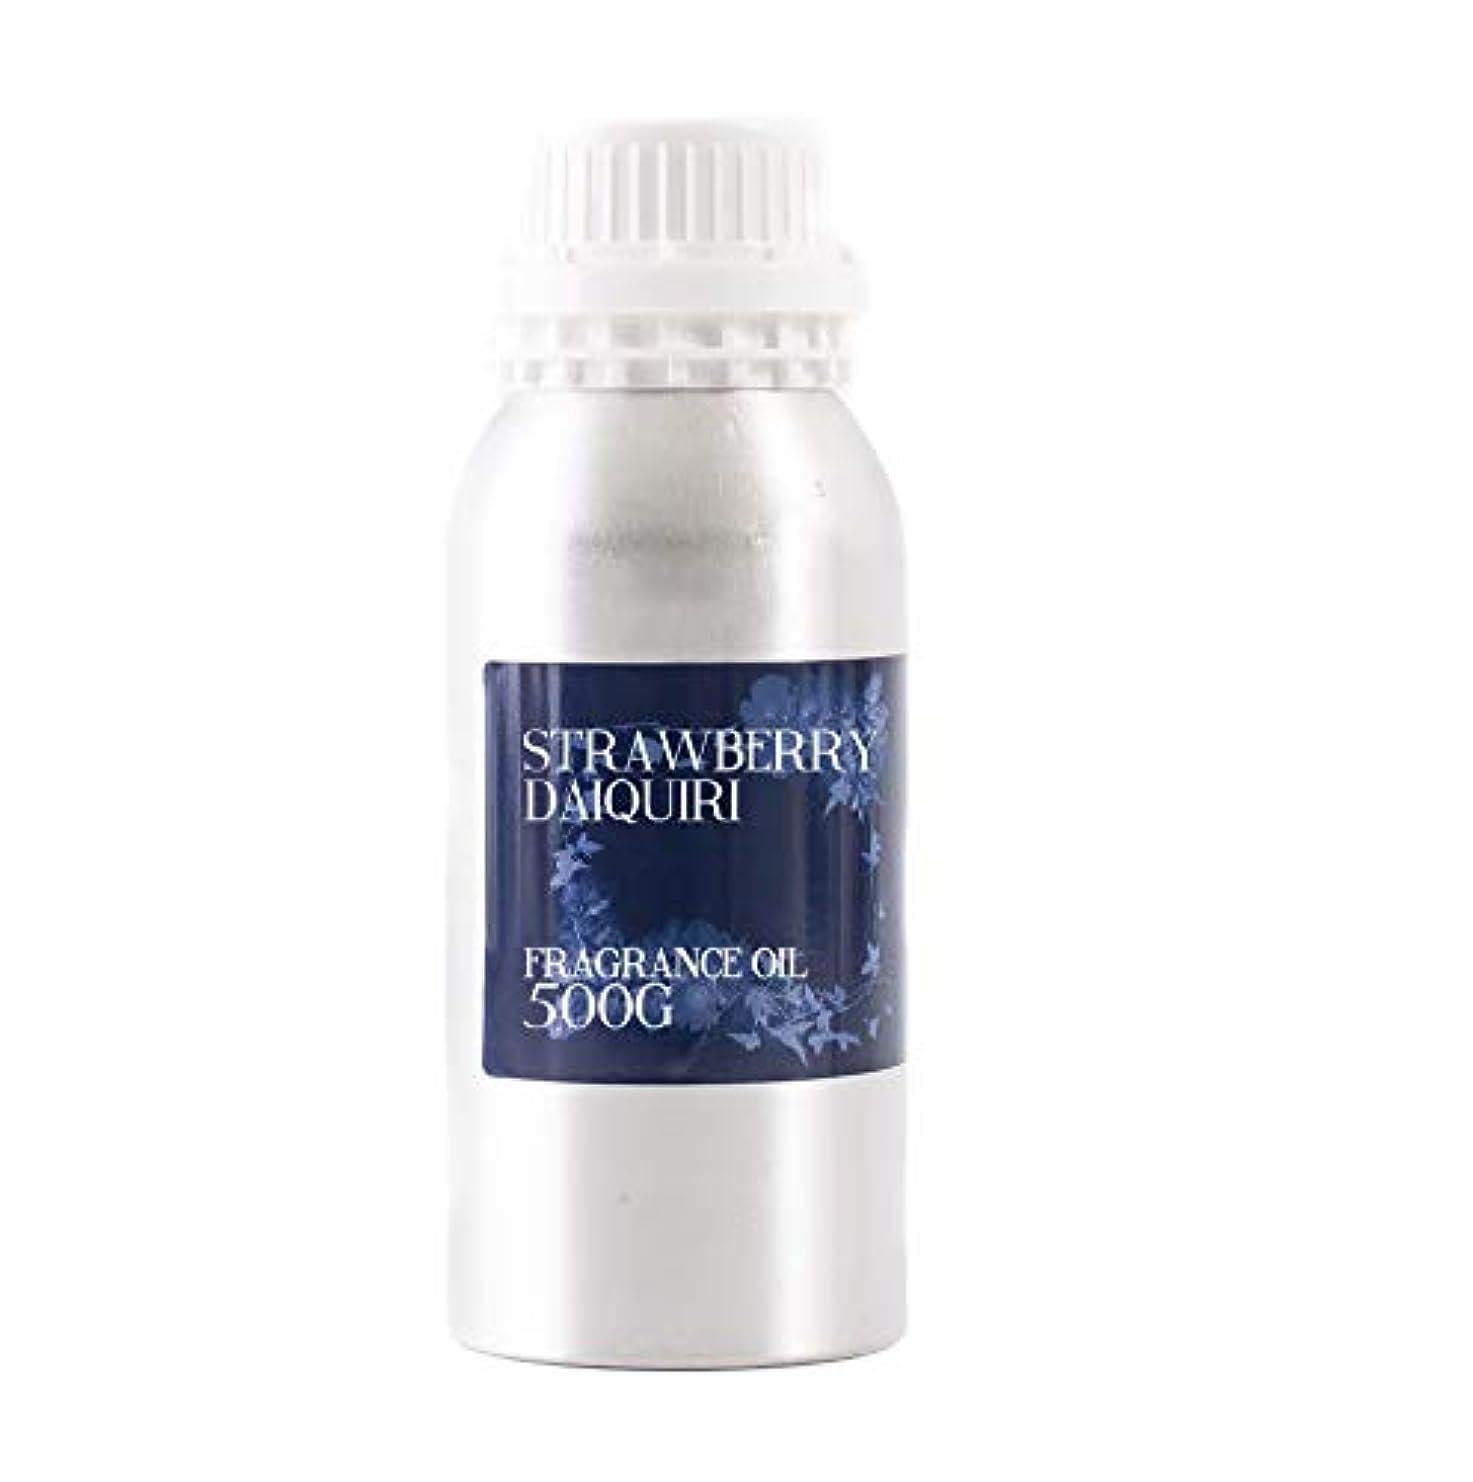 Mystic Moments | Strawberry Daiquiri Fragrance Oil - 500g